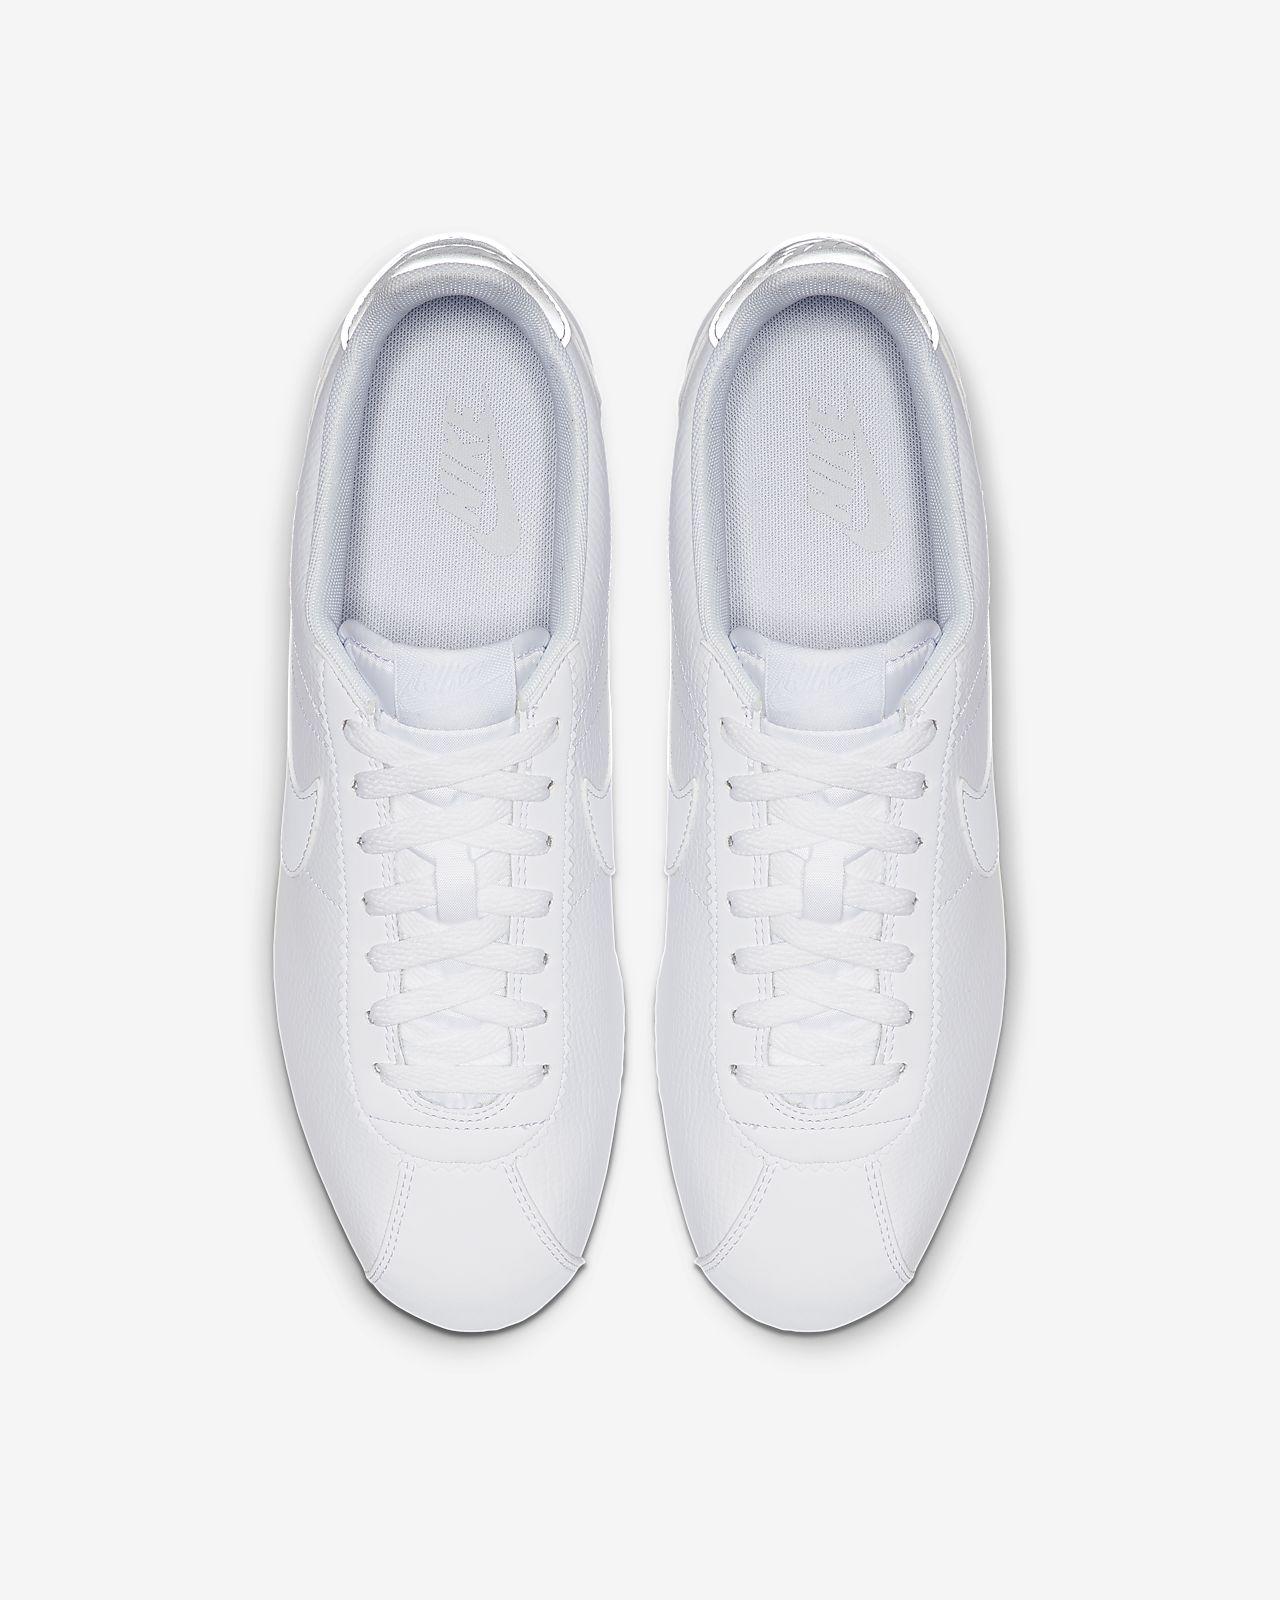 detailed look a6bff 3e1da ... Nike Classic Cortez Men s Shoe